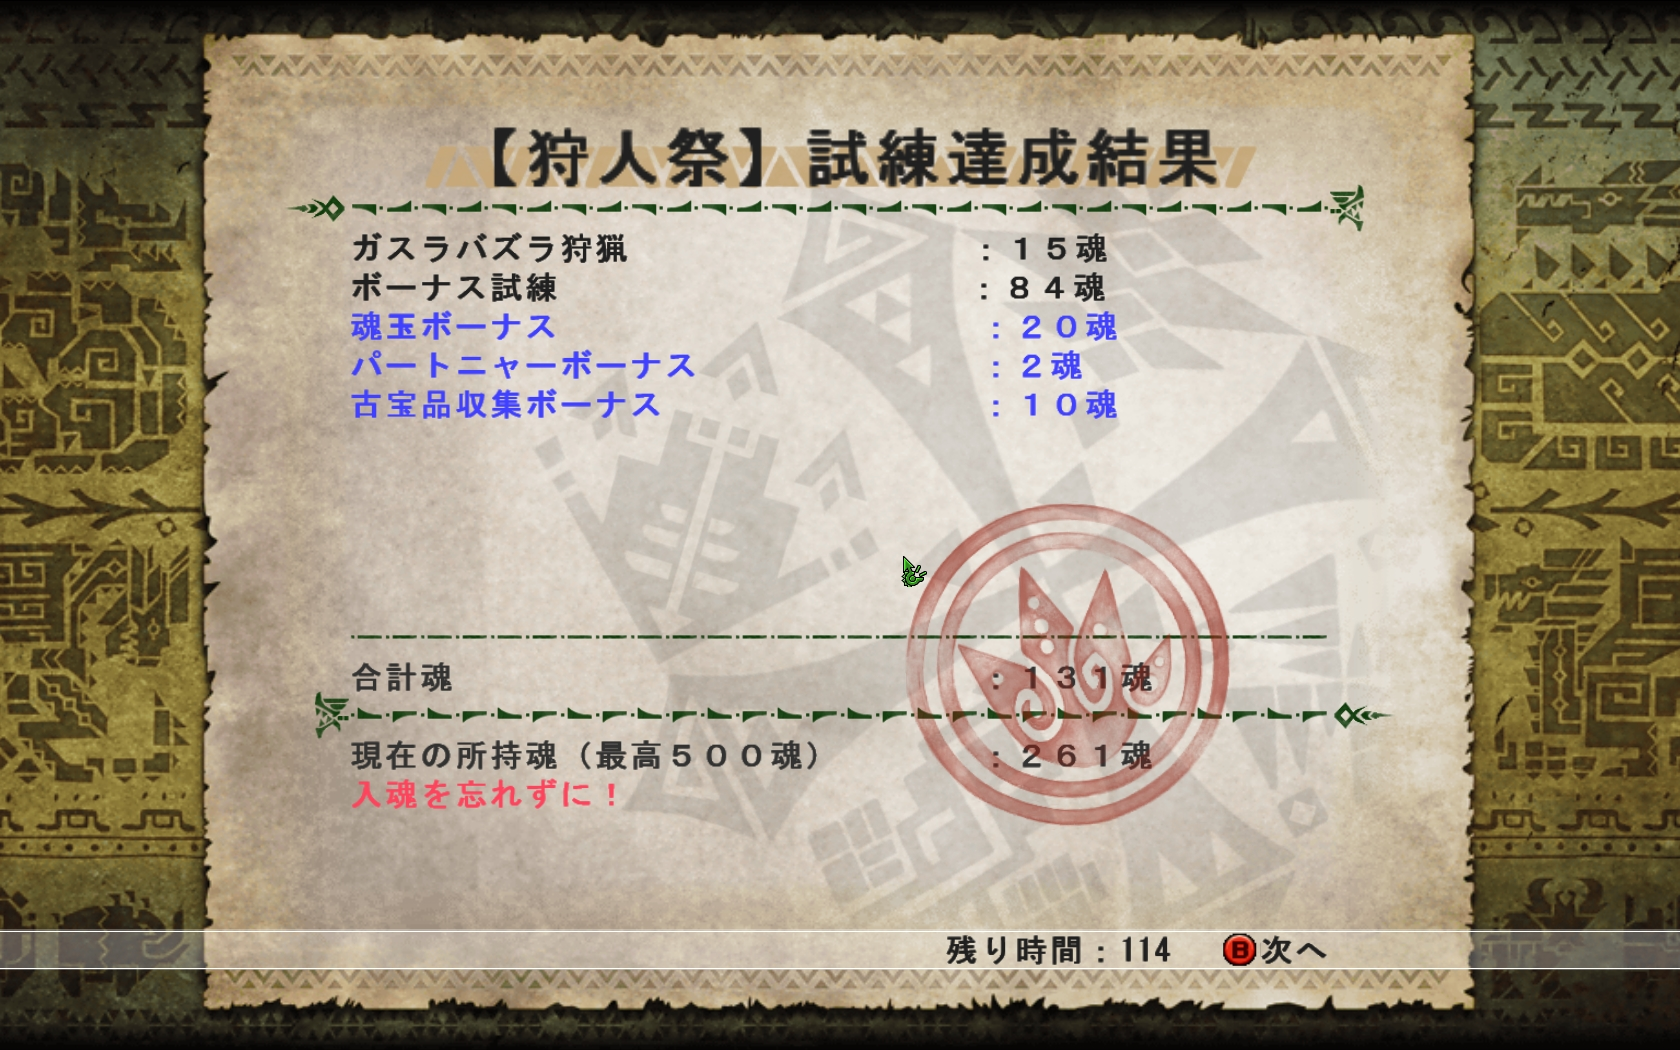 mhf_20151009_160223_704.jpg